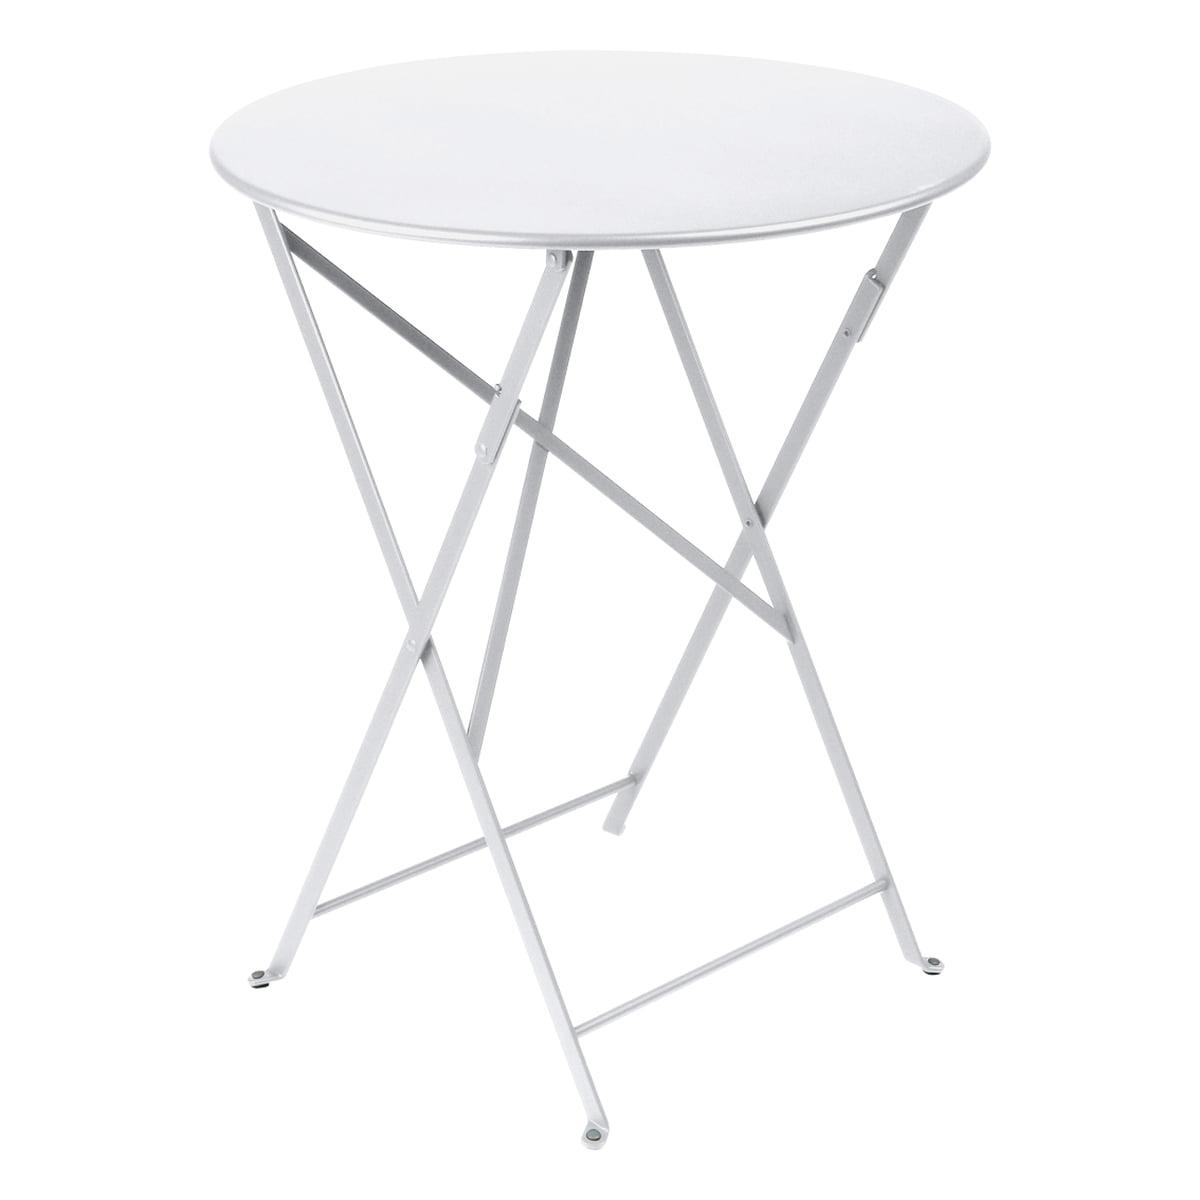 Klapptisch 60.Fermob Bistro Folding Table ø 60 Cm Cotton White